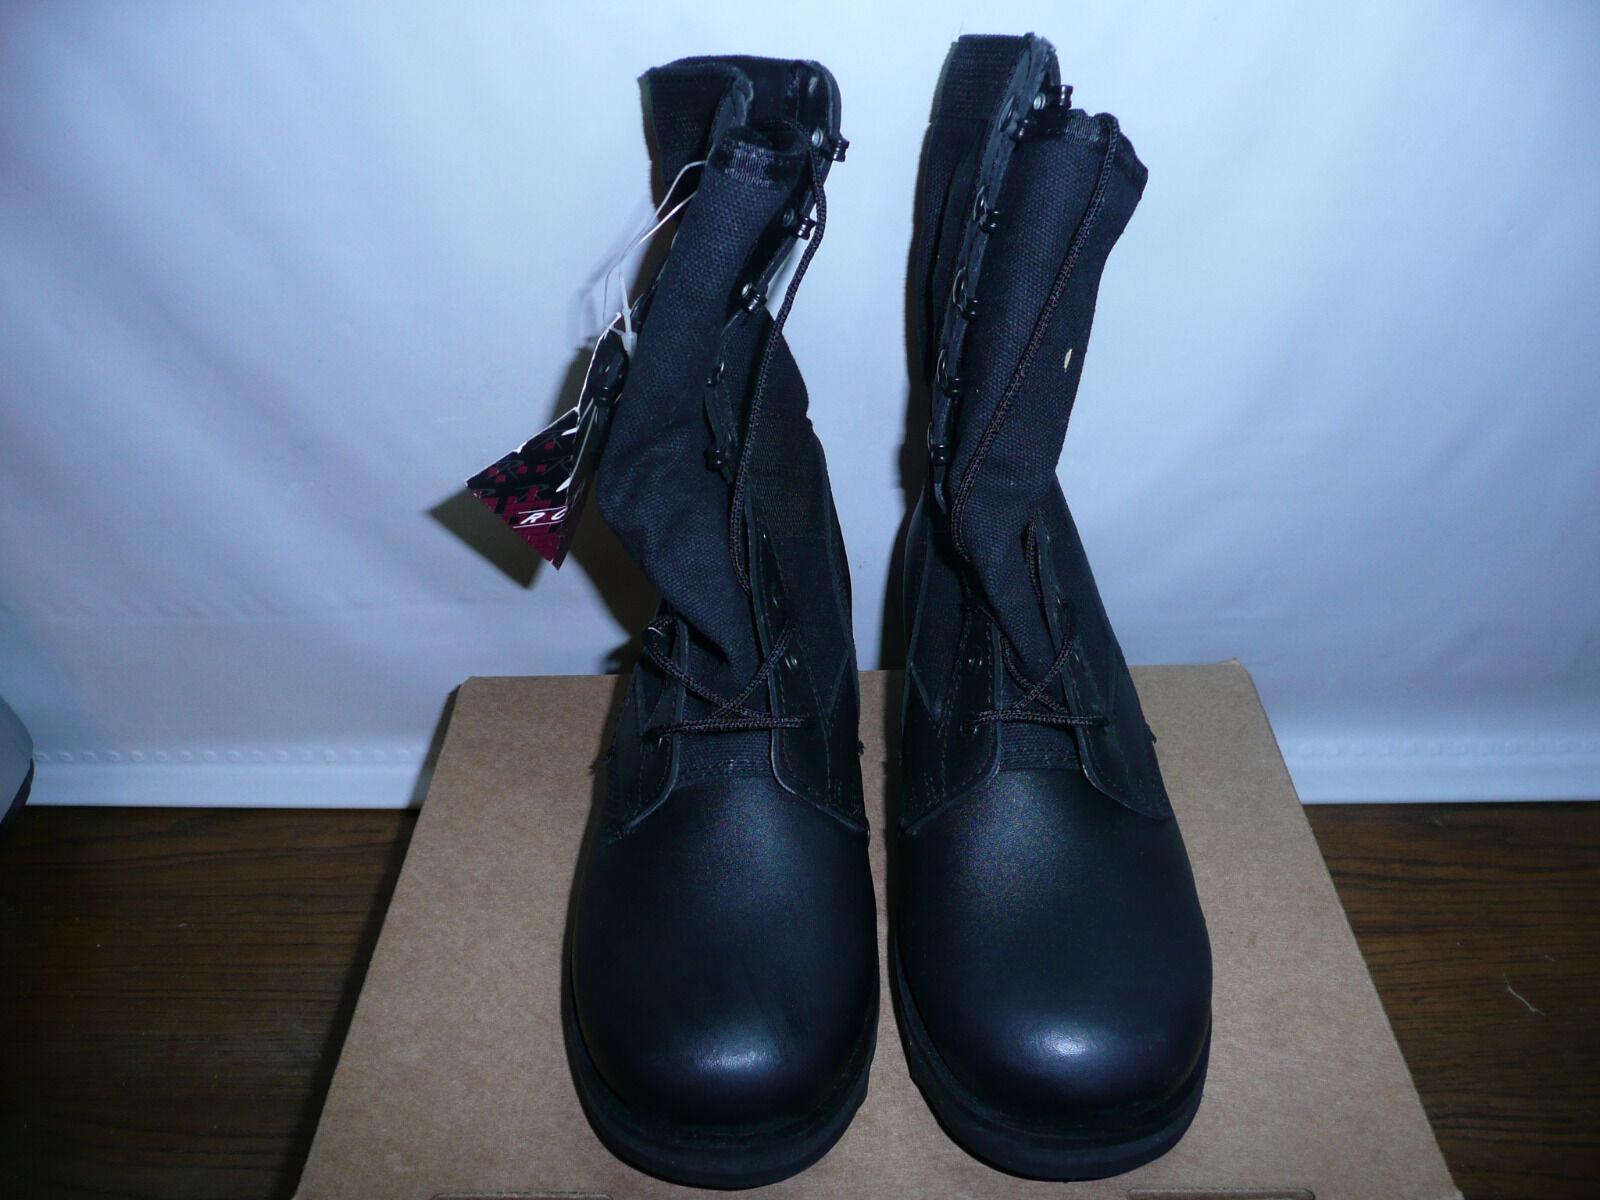 Rothco Men's Black Ripple Sole Jungle Boots, 4M US